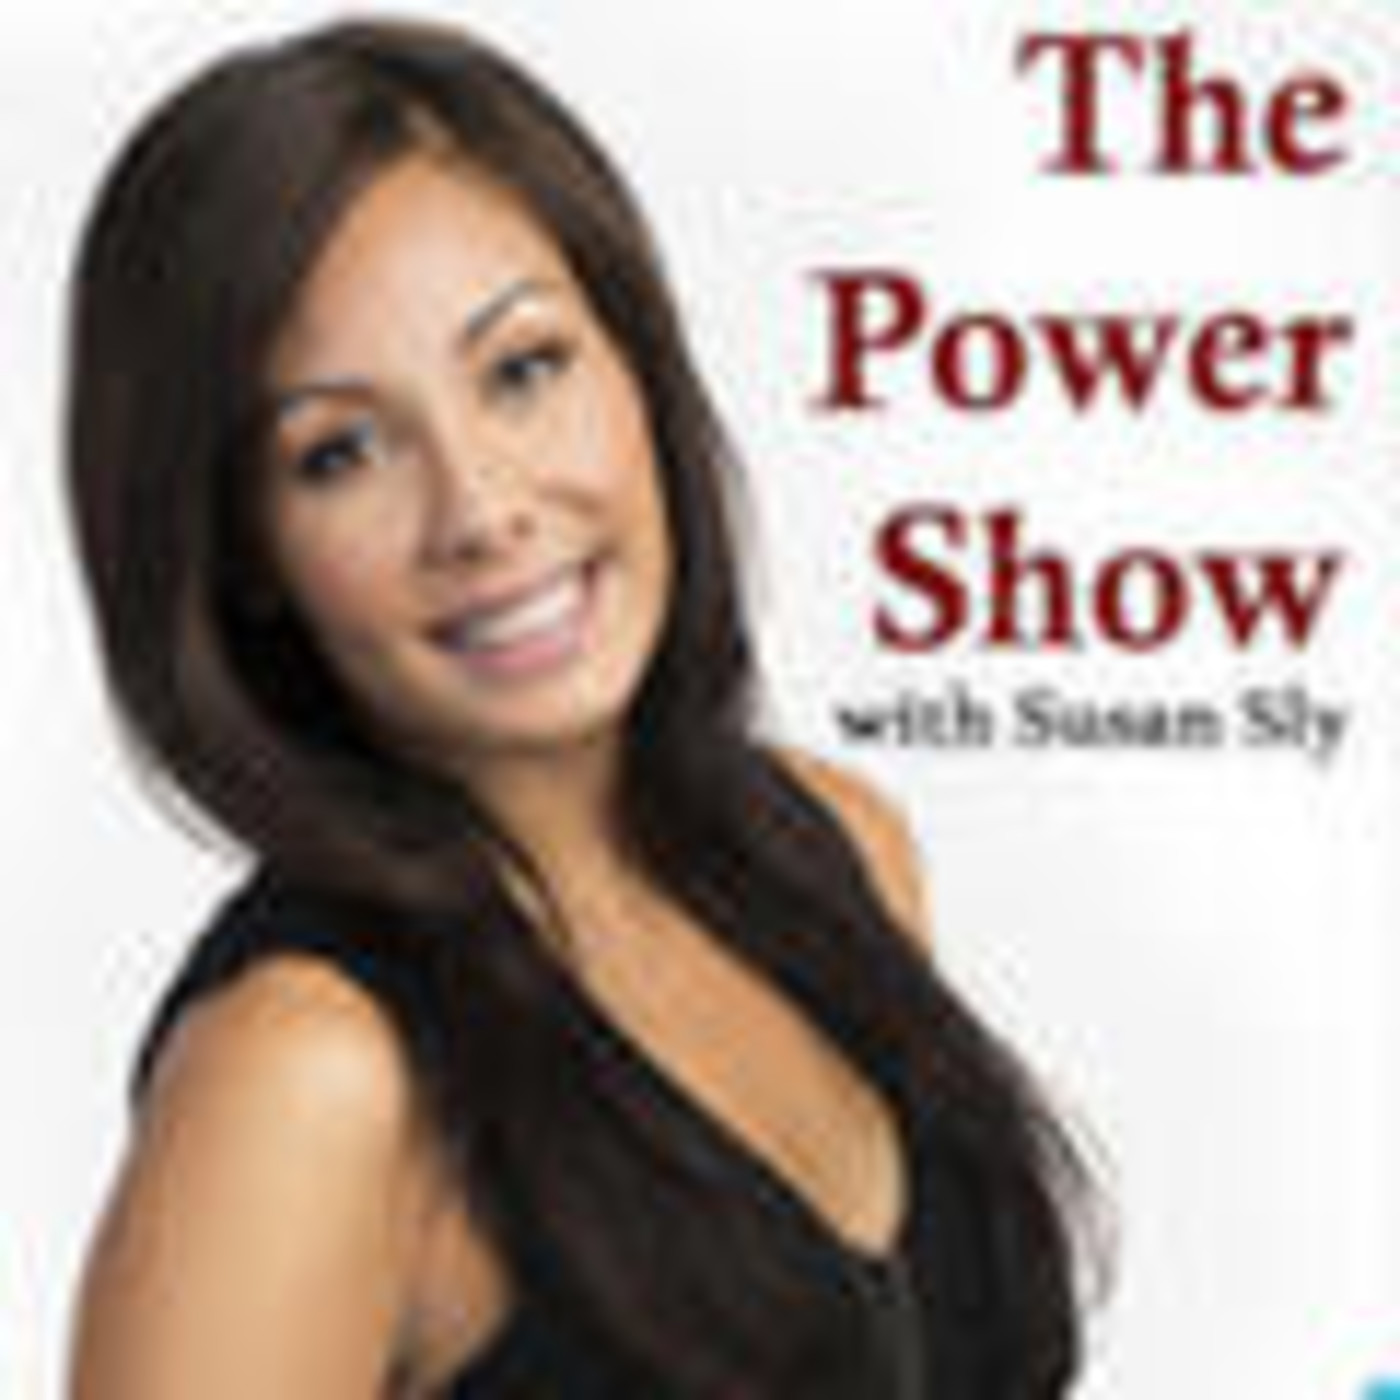 Susan Sly